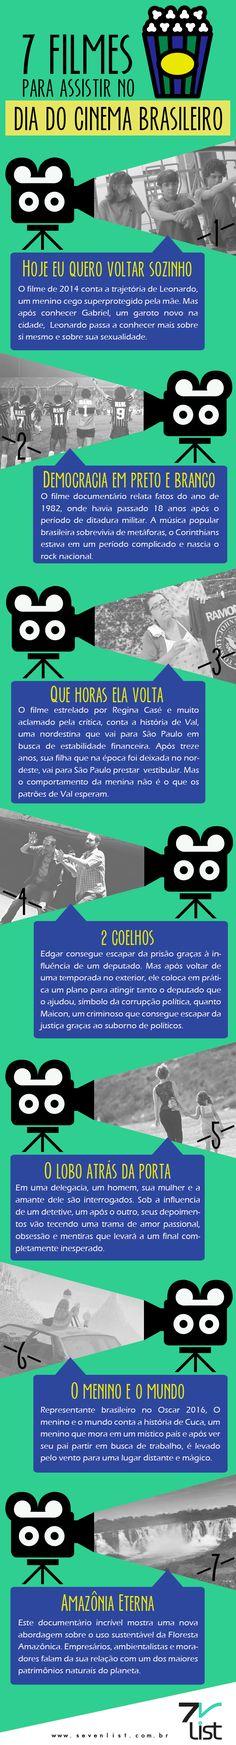 #Cinema #Brasil #Filmes #Entretenimento #Infográficos #Movies